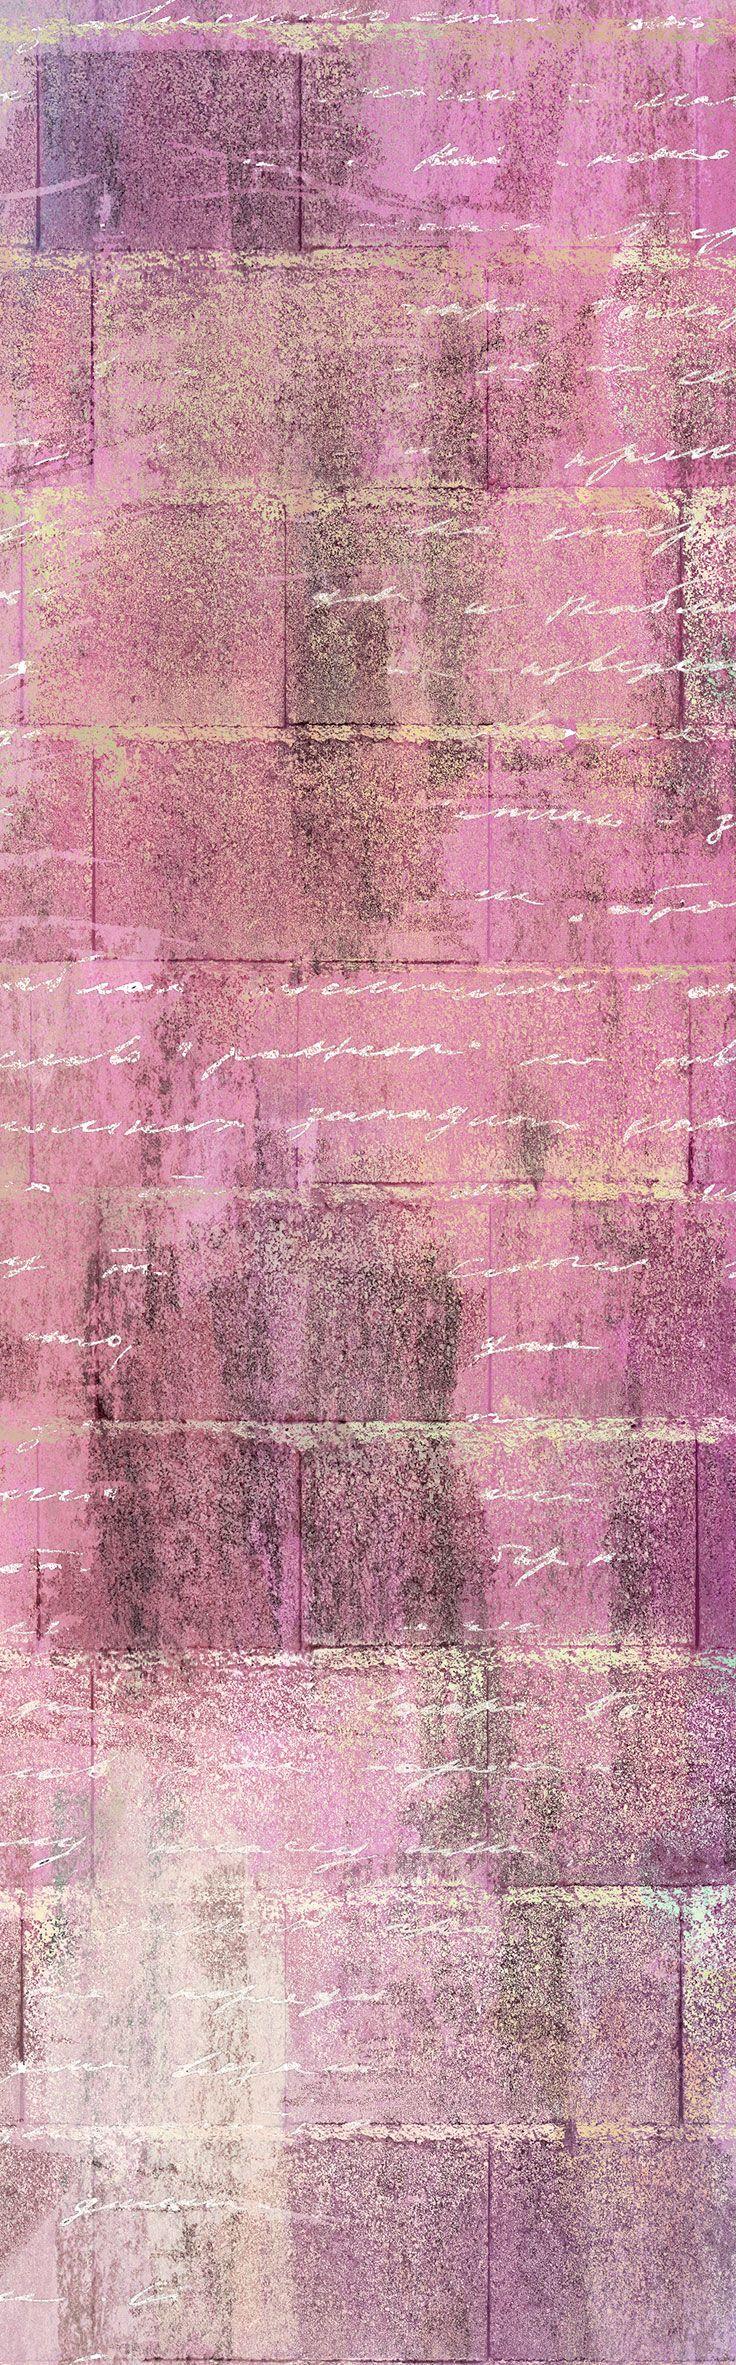 Carta da parati / Wall paper: CHARLIE – Colored #Tecnografica #ItalianWallcoverings #cartadaparati #wallpaper #rosa #pink #arredamentodinterni #interiordesign #design #cameradaletto #moderna #soggiorno #art #scritte #ideas #bedroom #modern #livingroom #words